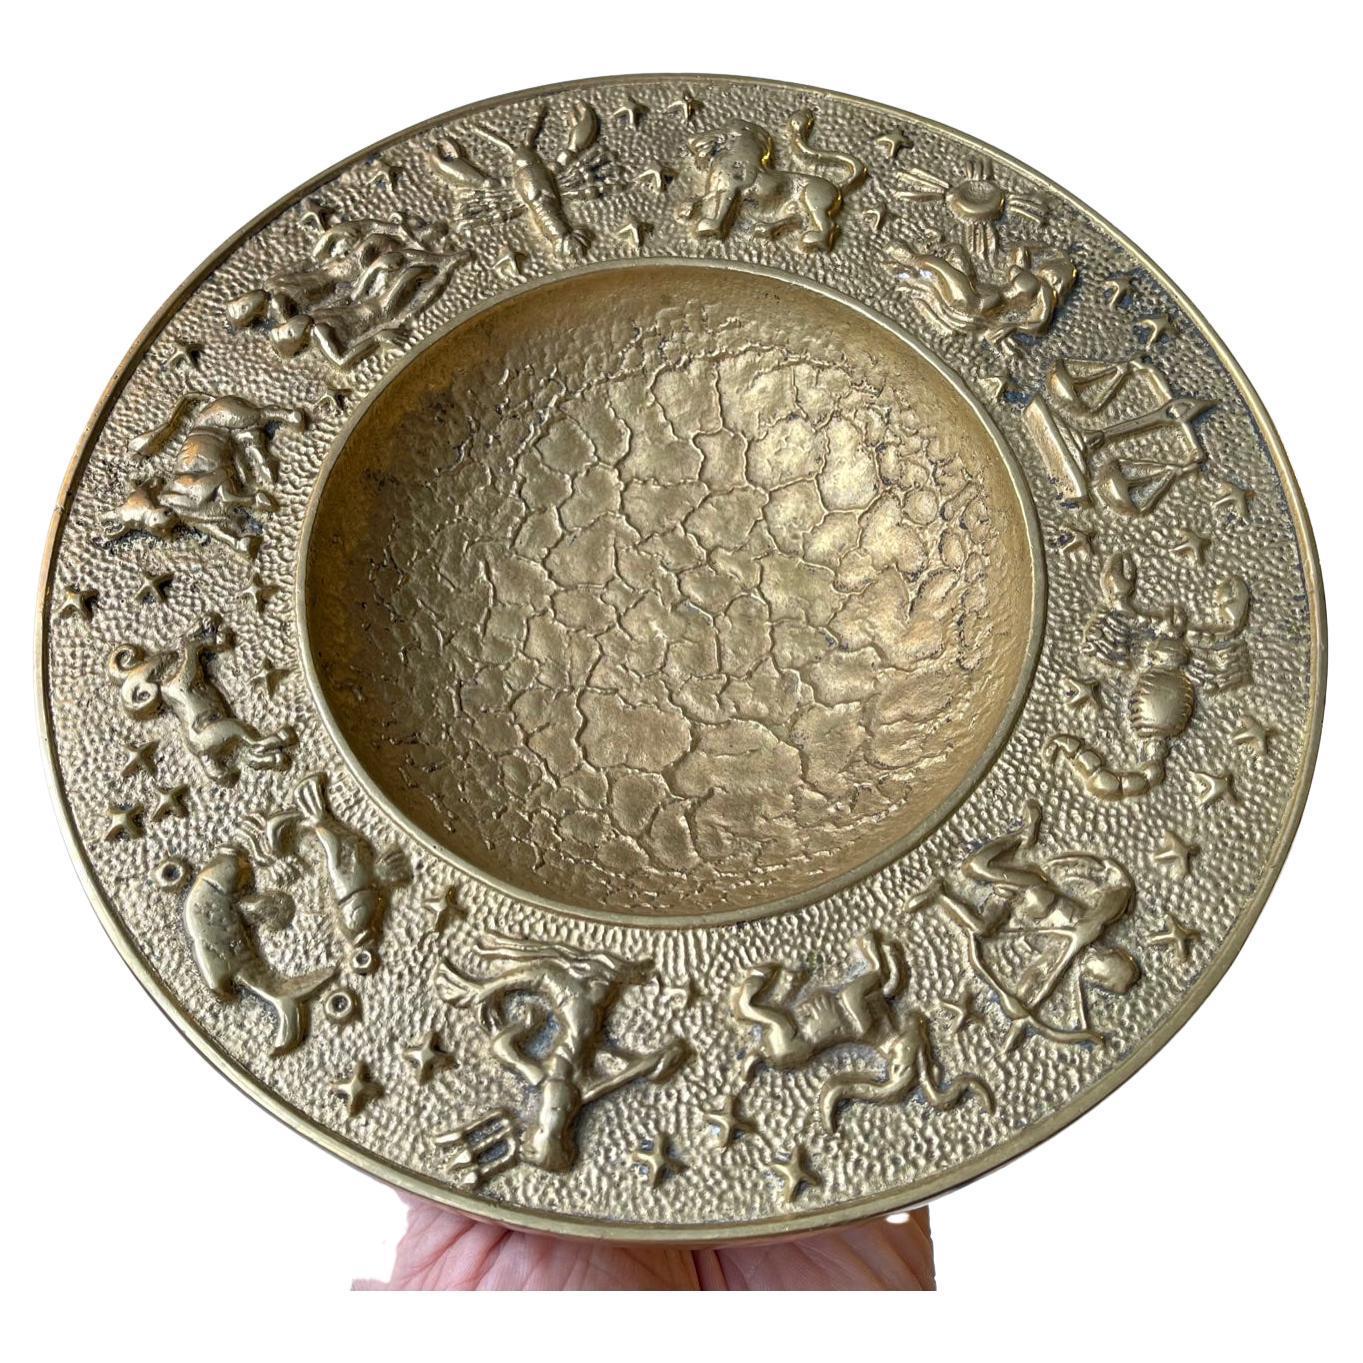 Vintage Danish Zodiac Bronze Bowl with Moon Texturing, 1940s